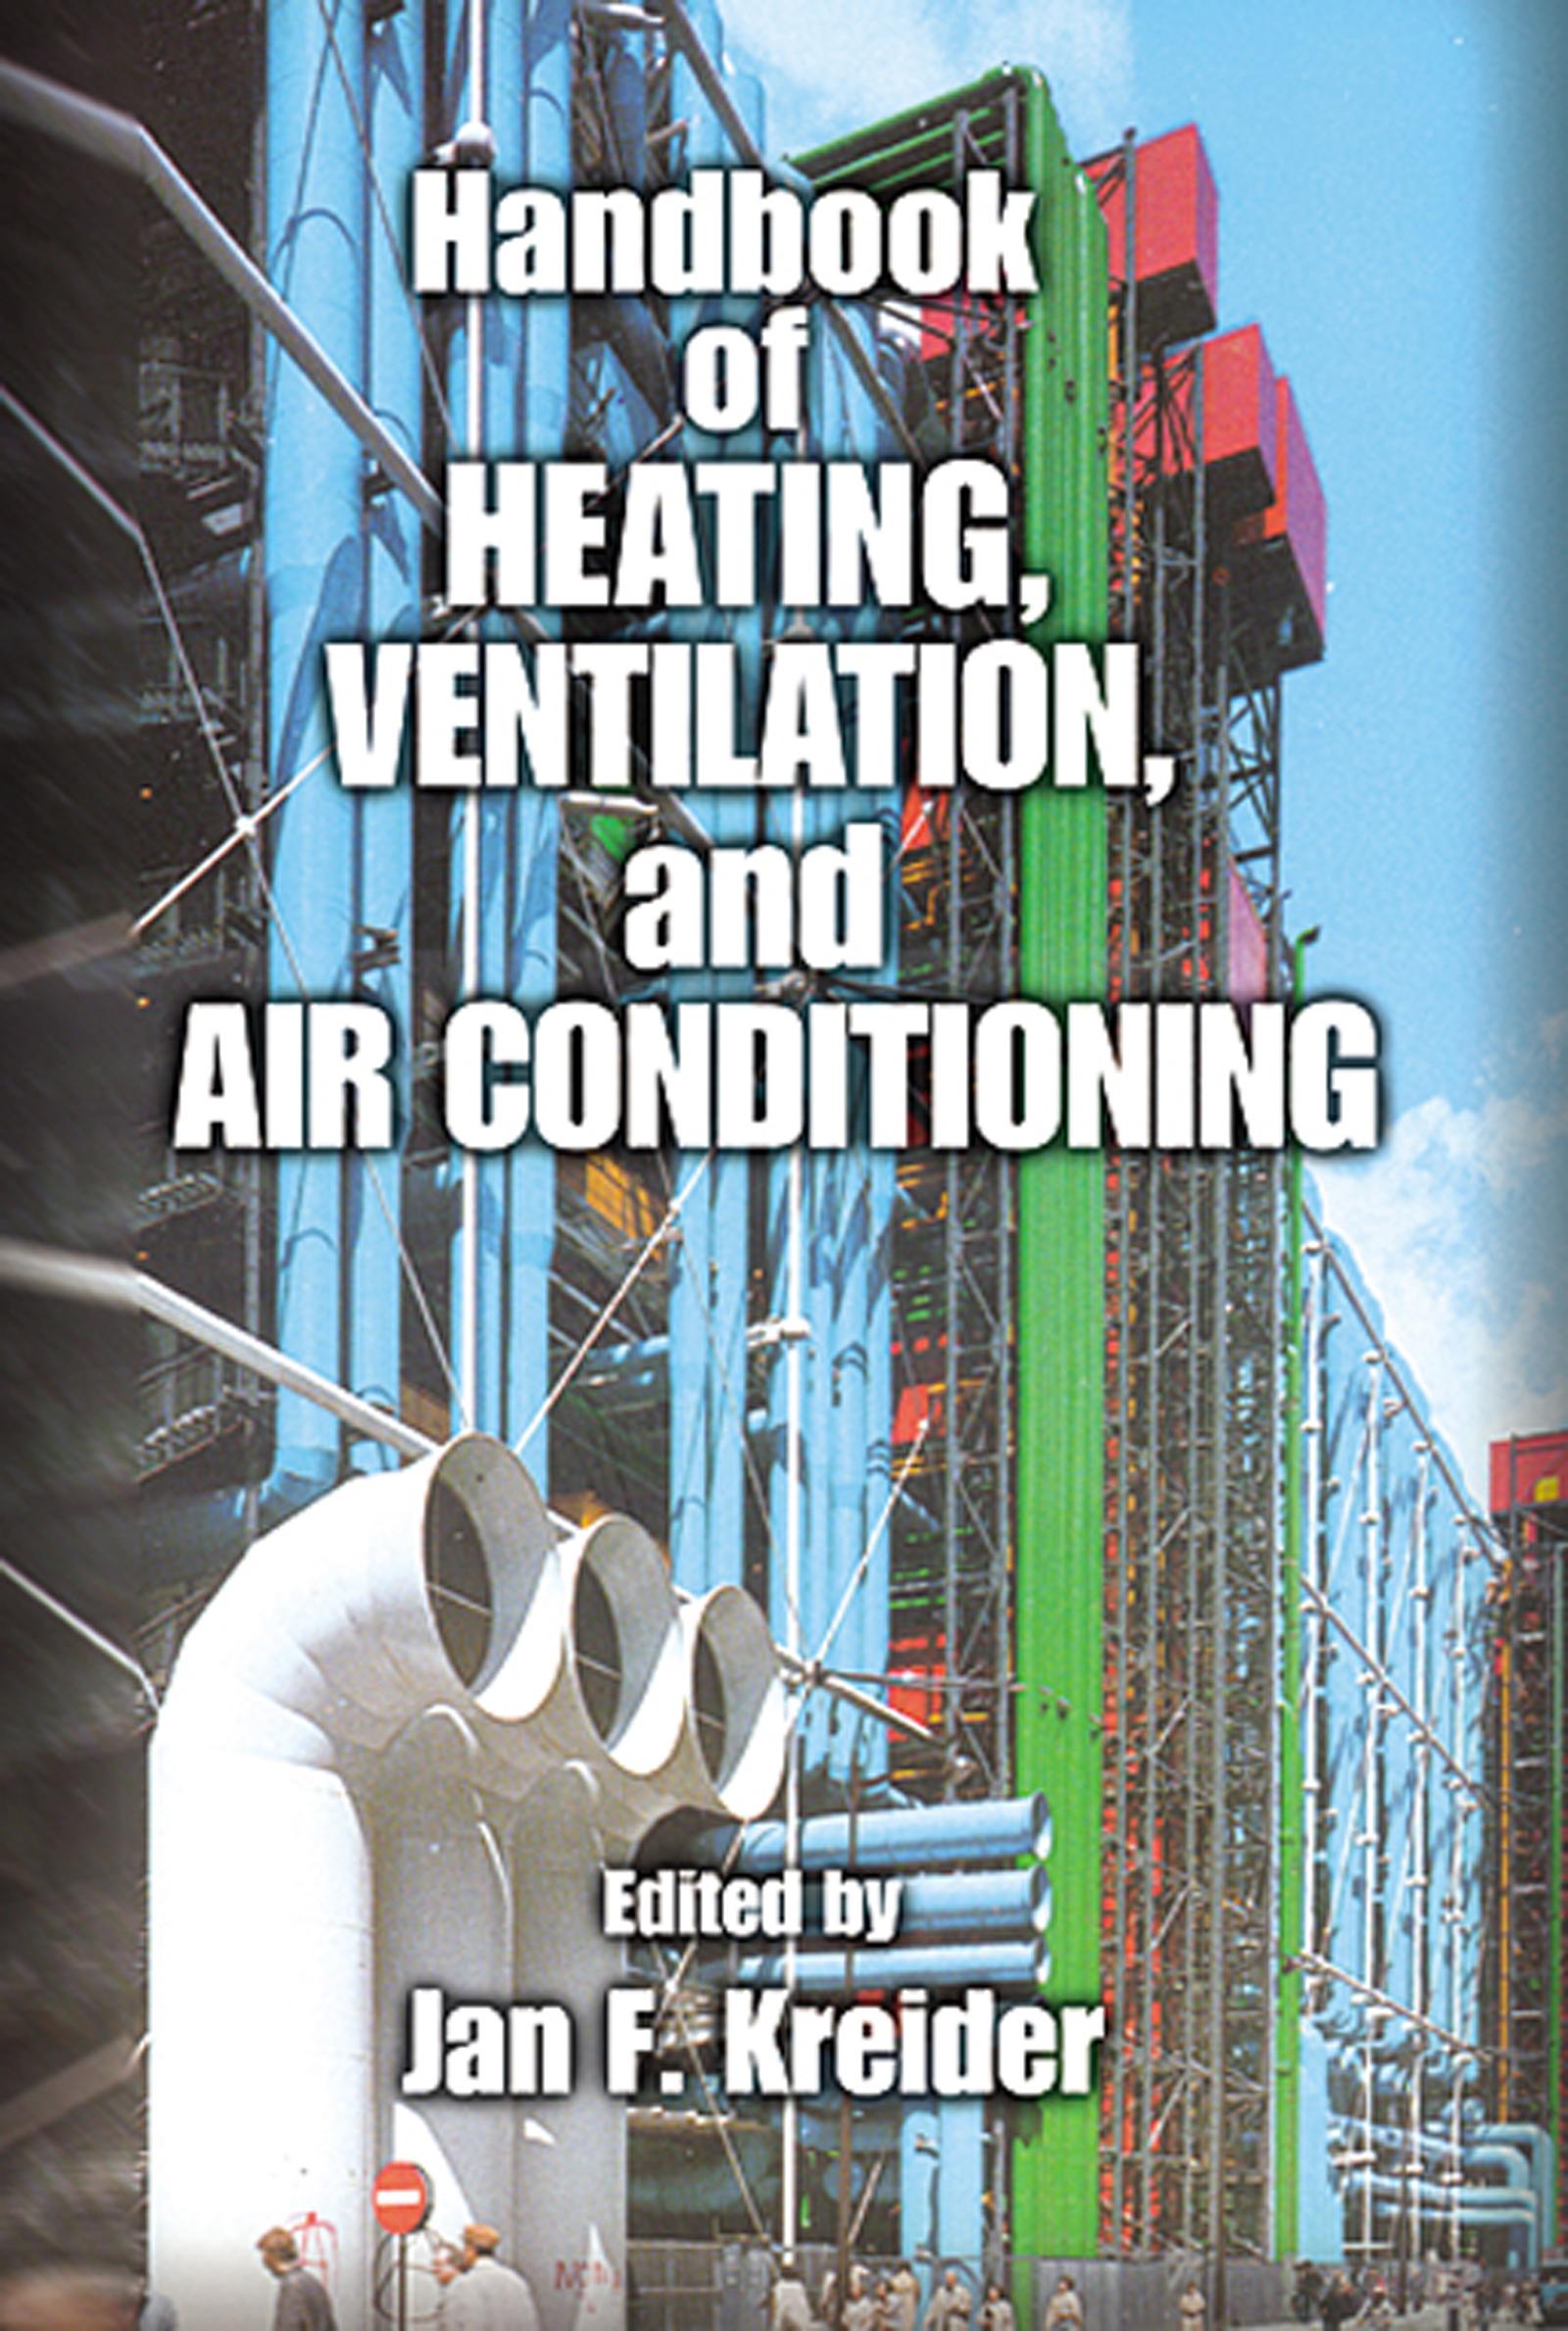 Handbook of Heating, Ventilation, and Air Conditioning